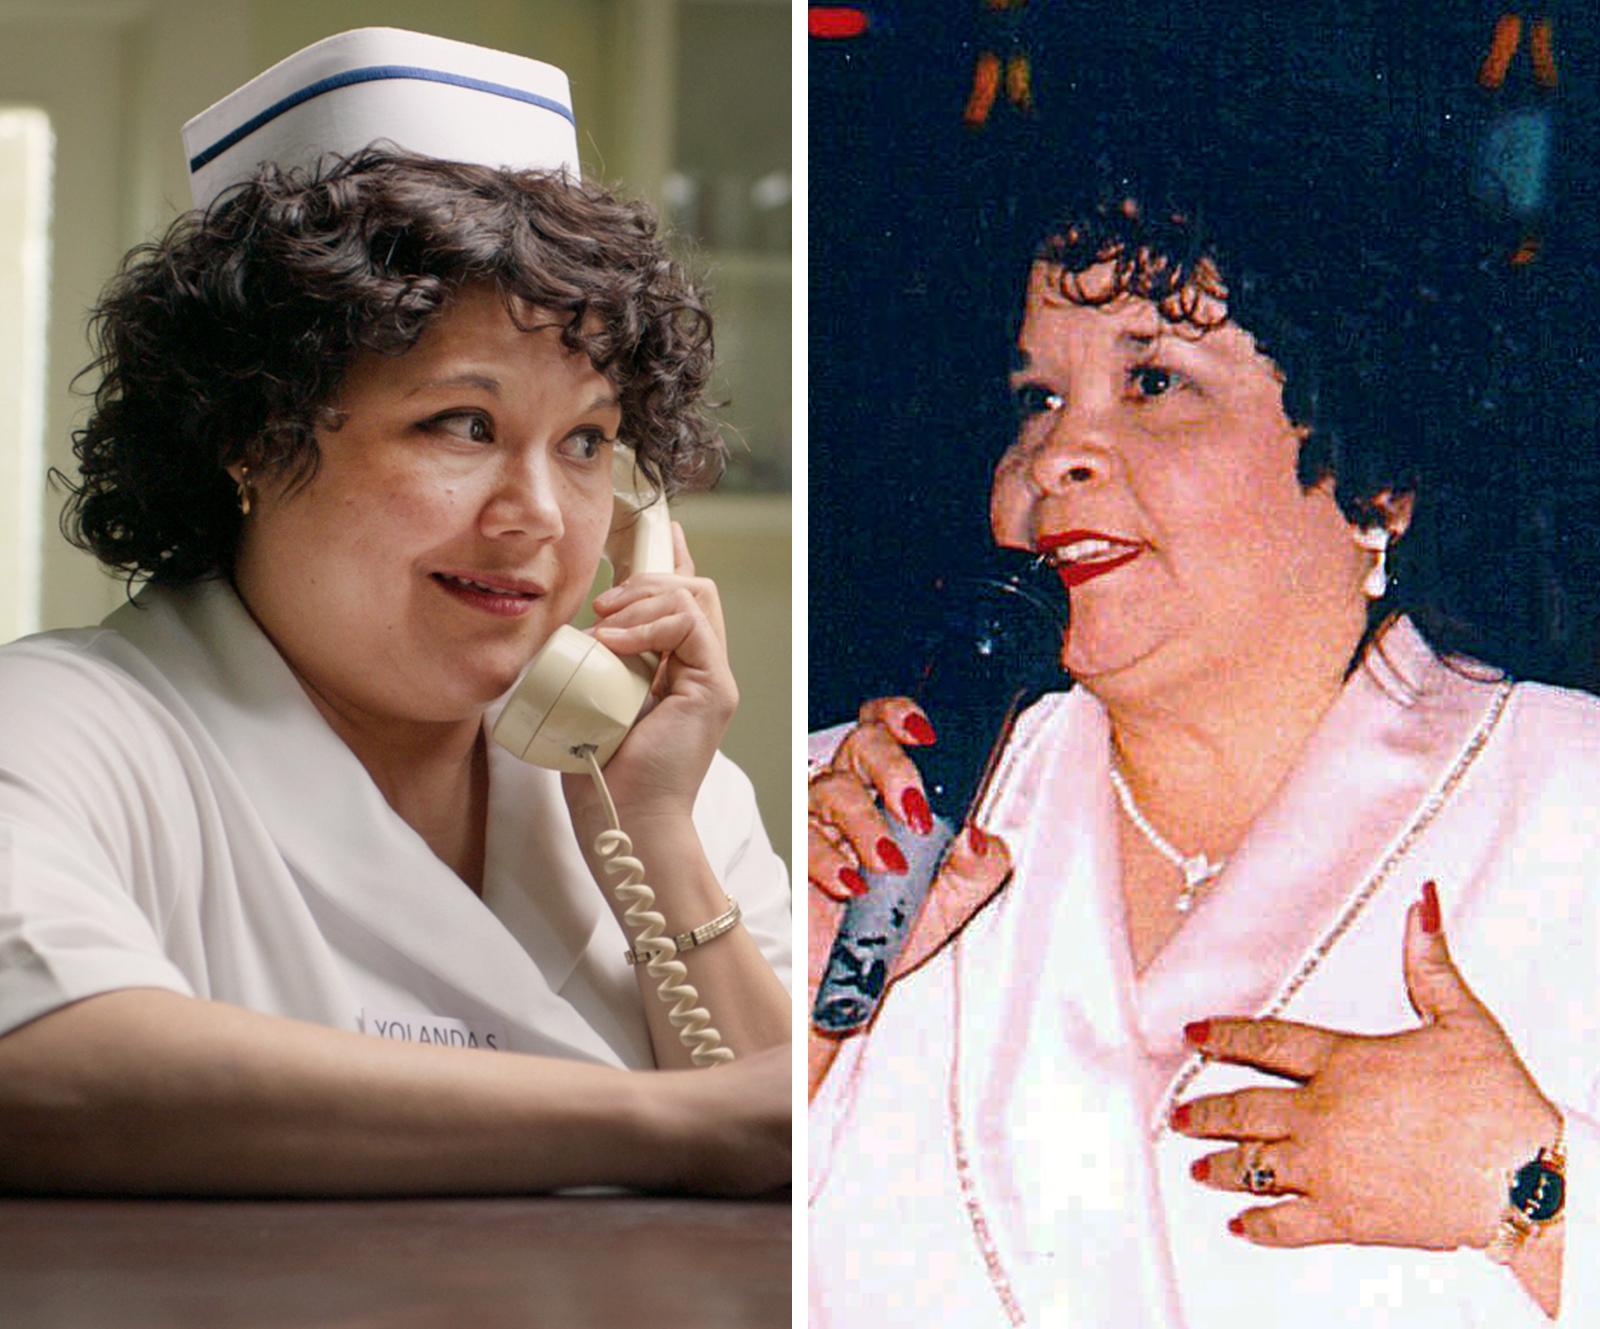 Natasha Pérez, la actriz que interpreta a Yolanda Saldívar en Selena The Series